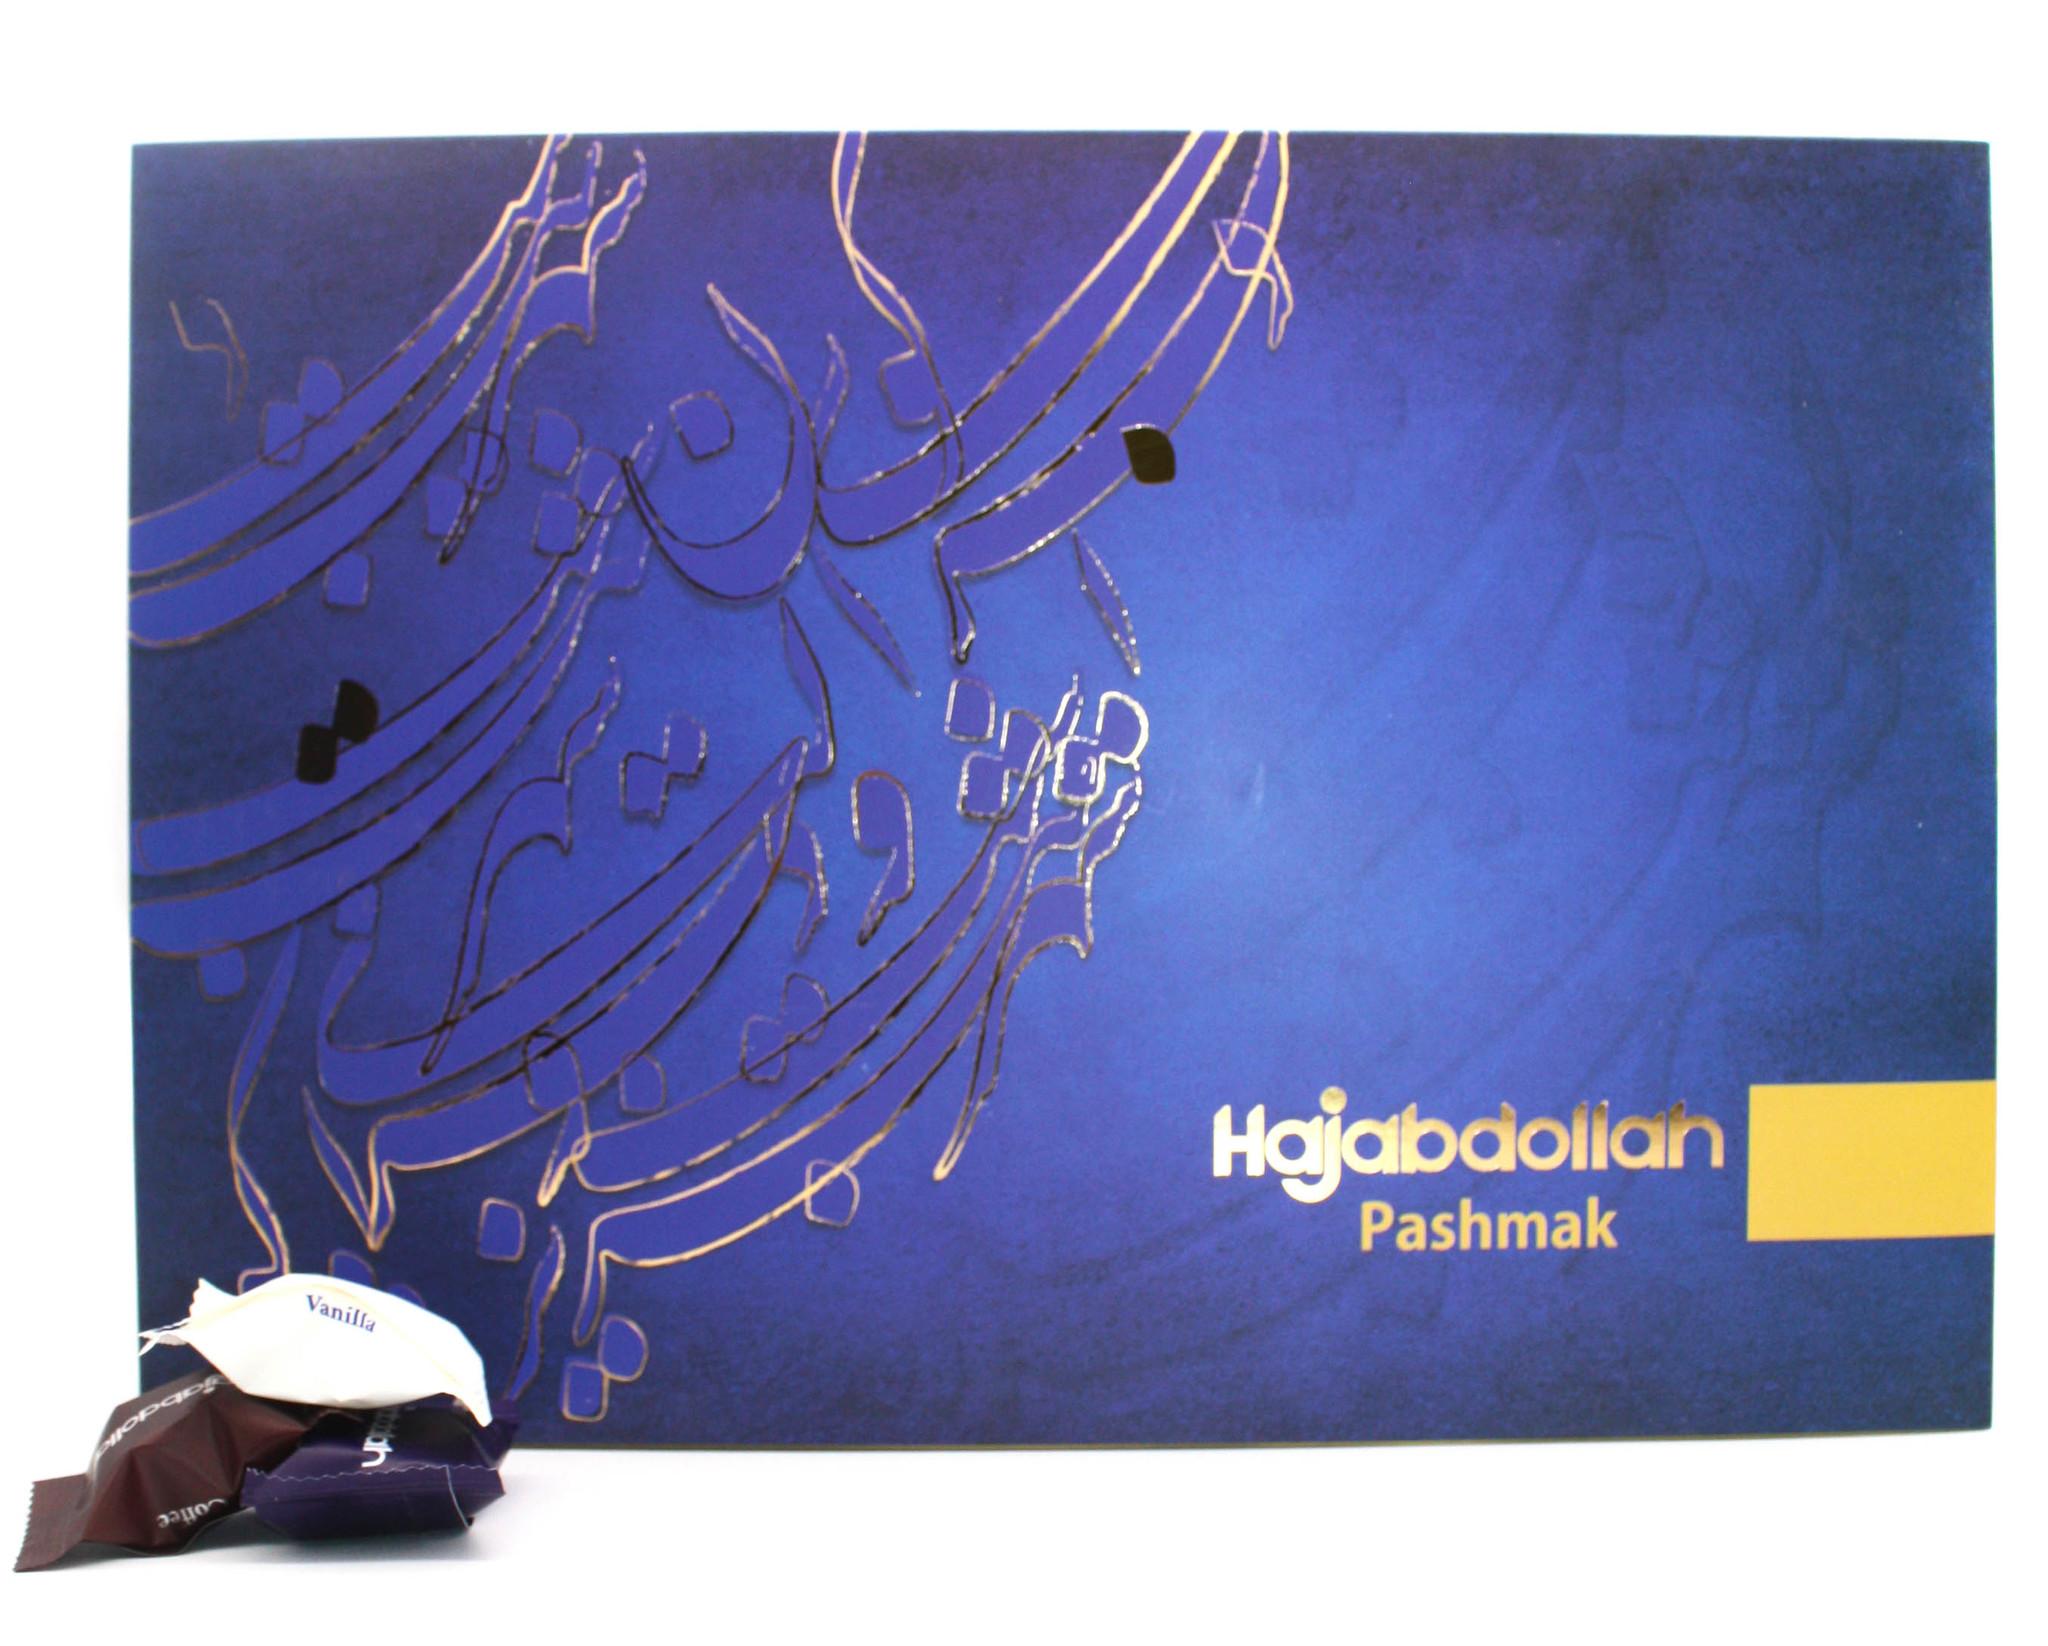 "Hajabdollah Ассорти пишмание в подарочной упаковке ""Каллиграфия"", Hajabdollah, 300 г import_files_70_7007016dc40811e9a9b3484d7ecee297_70070170c40811e9a9b3484d7ecee297.jpg"